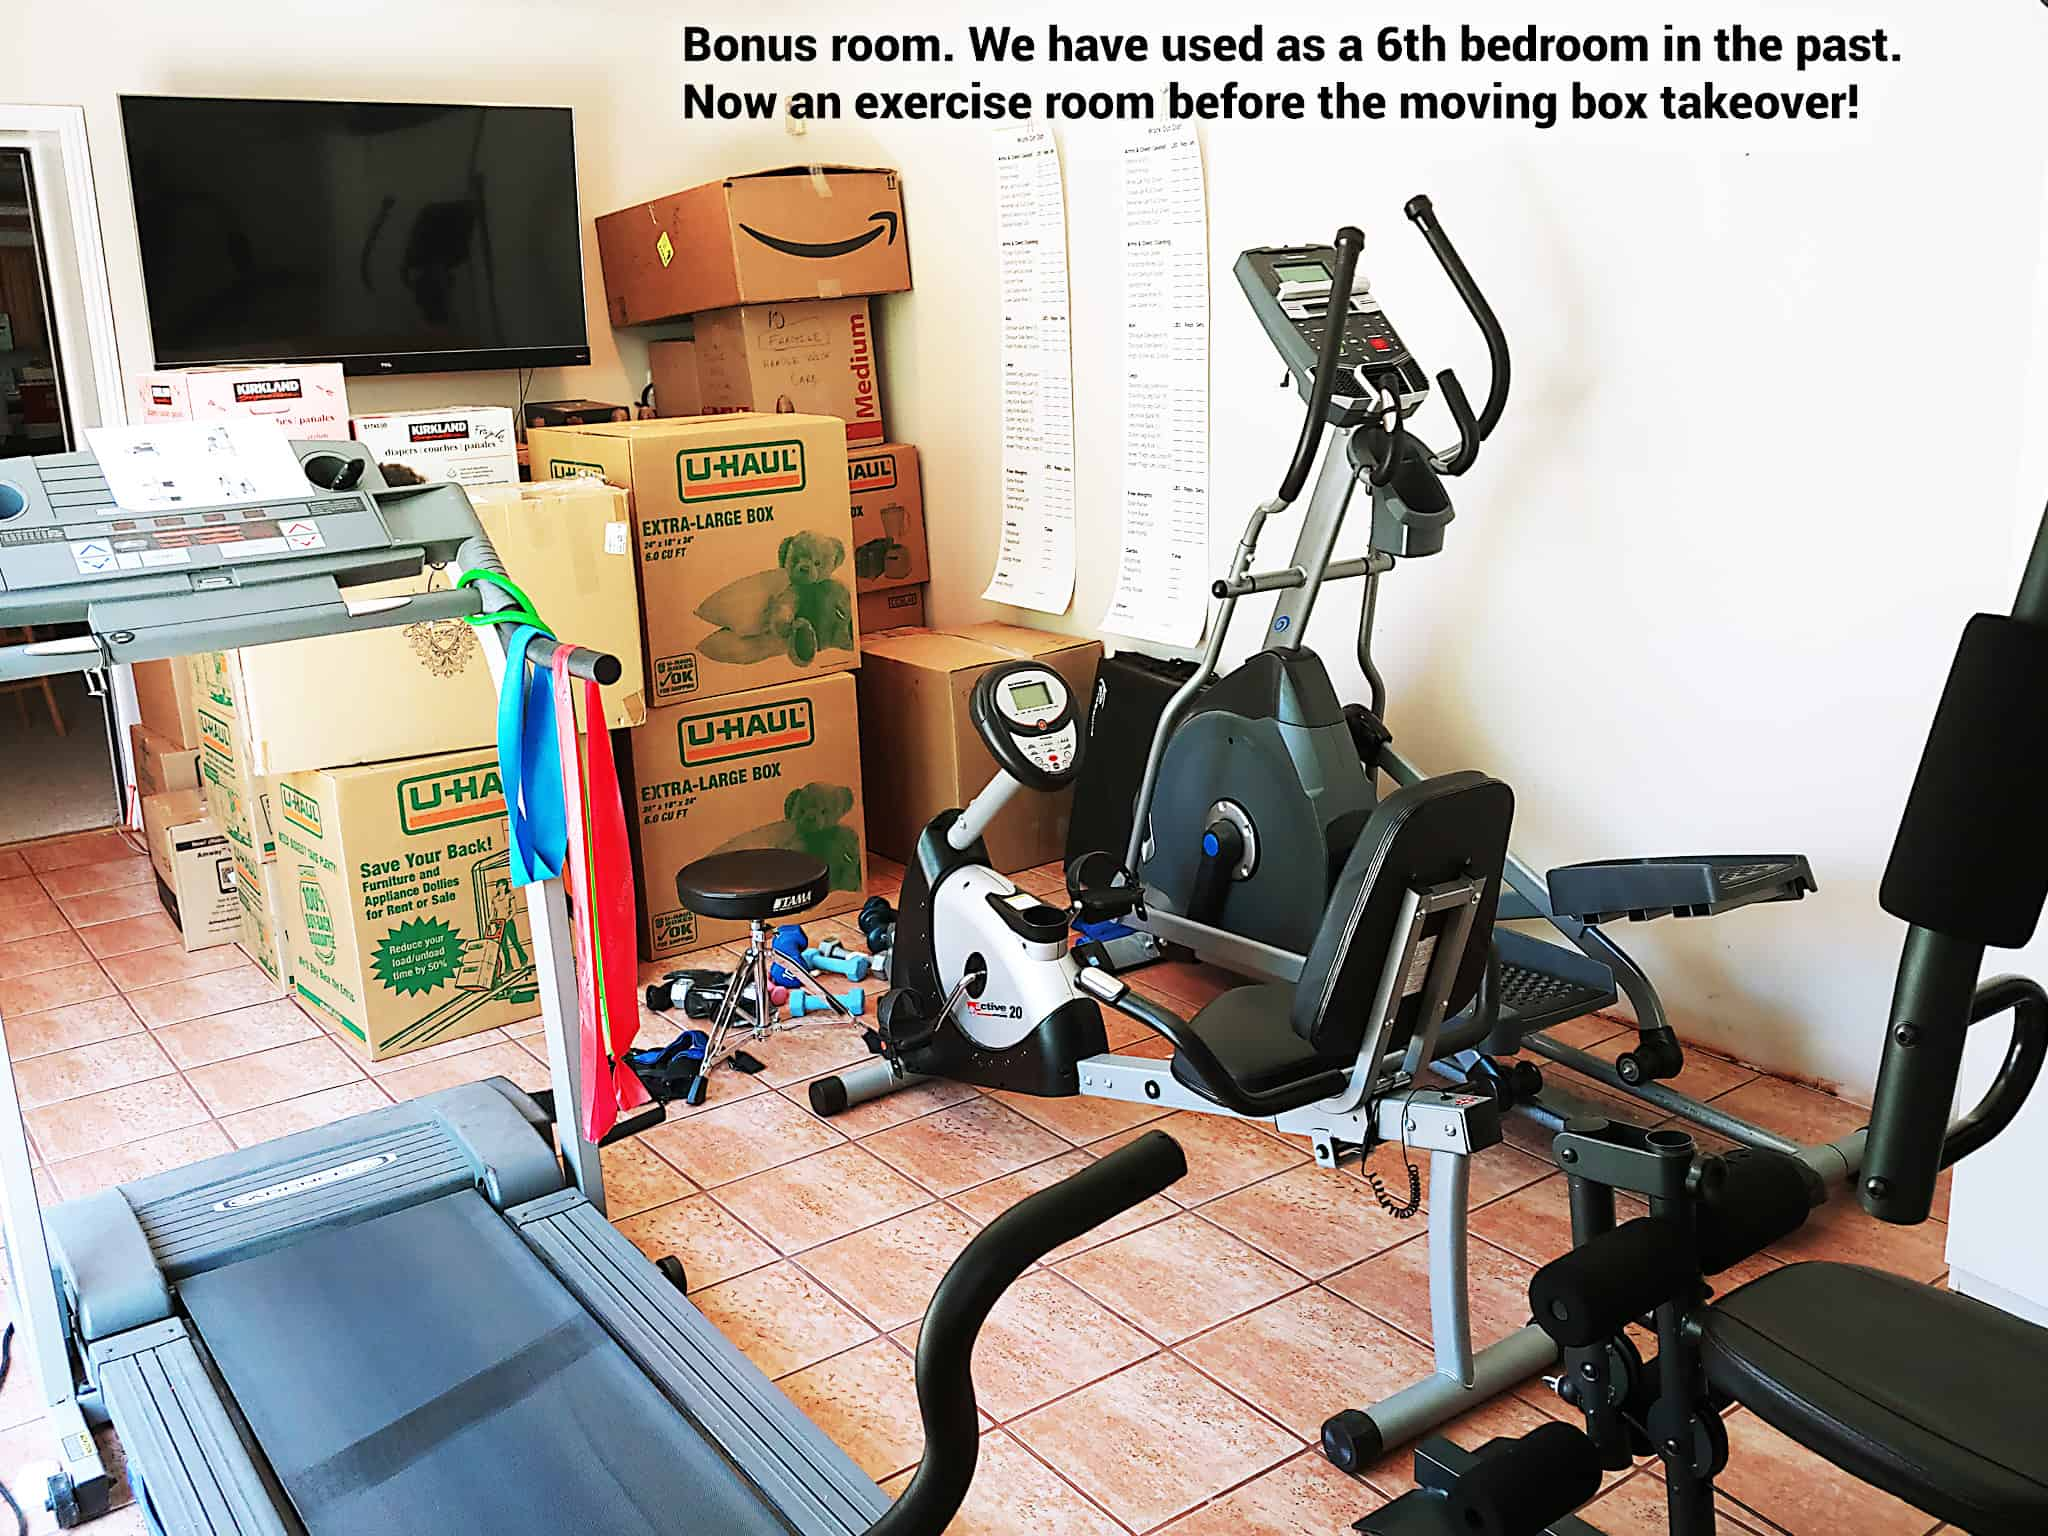 Exercise bonus room